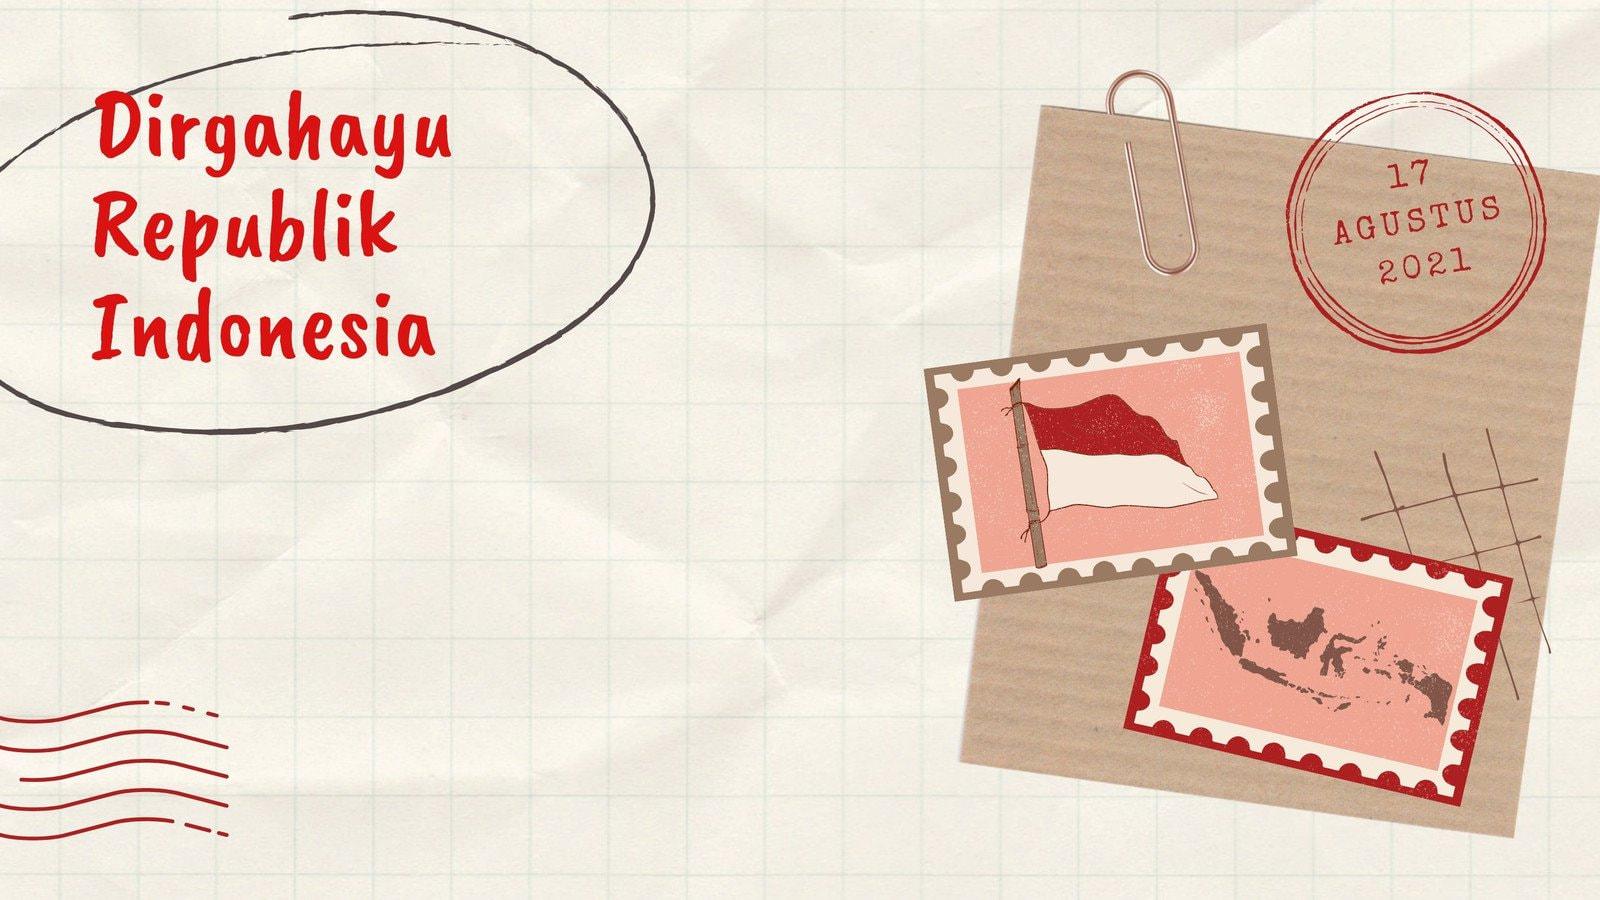 Latar Belakang Zoom Dirgahayu Republik Indonesia Kolase Putih Coklat Merah